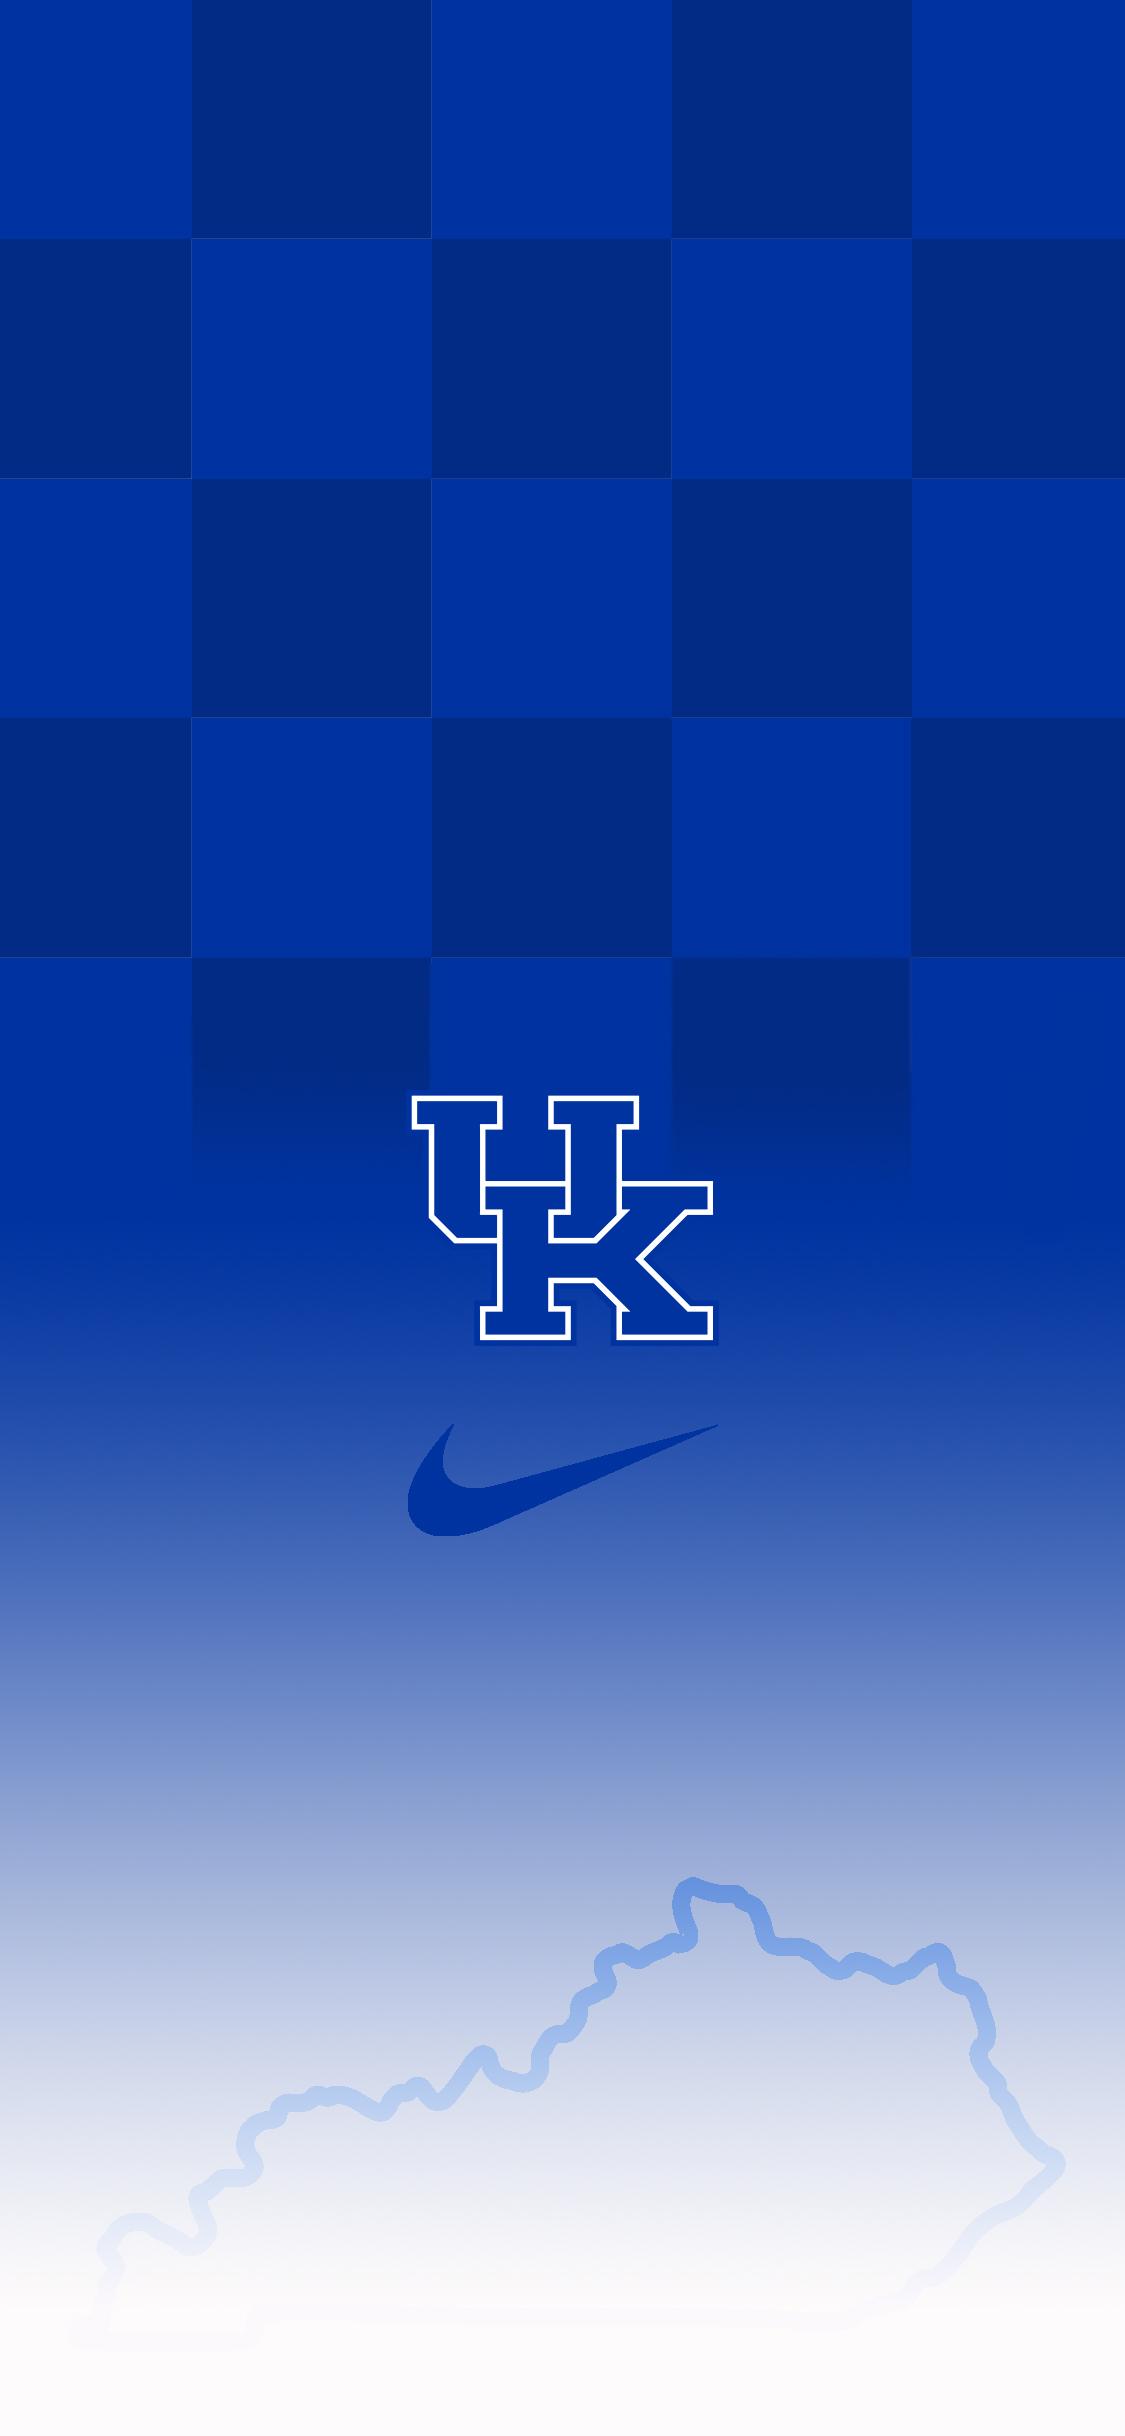 Kentucky Wildcats iPhone X Wallpaper   Album on Imgur 1125x2436